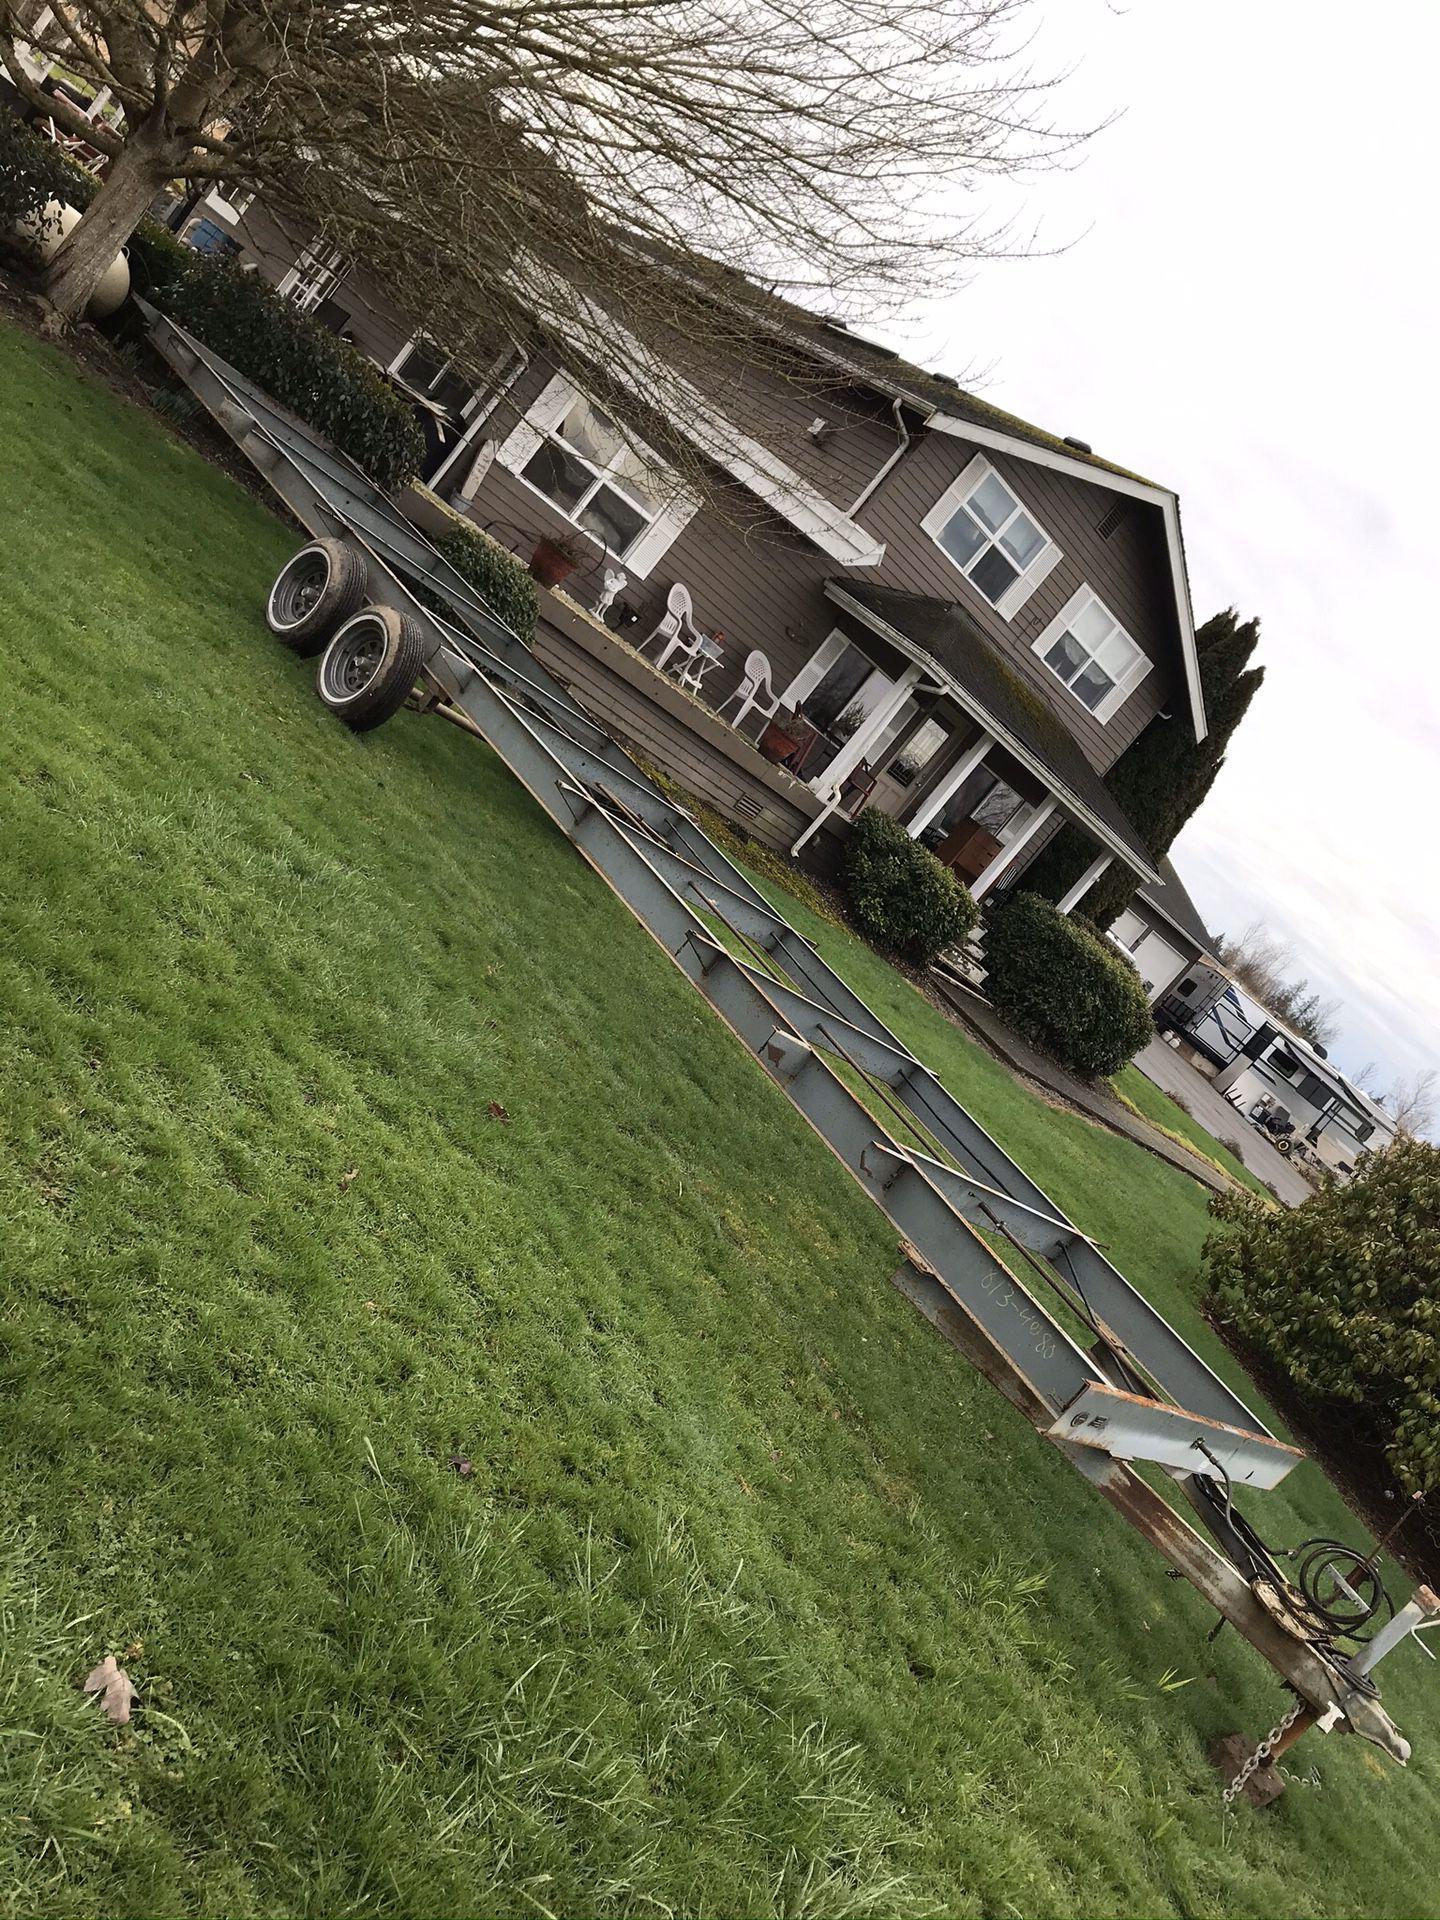 Tiny House Trailer or Car Hauler